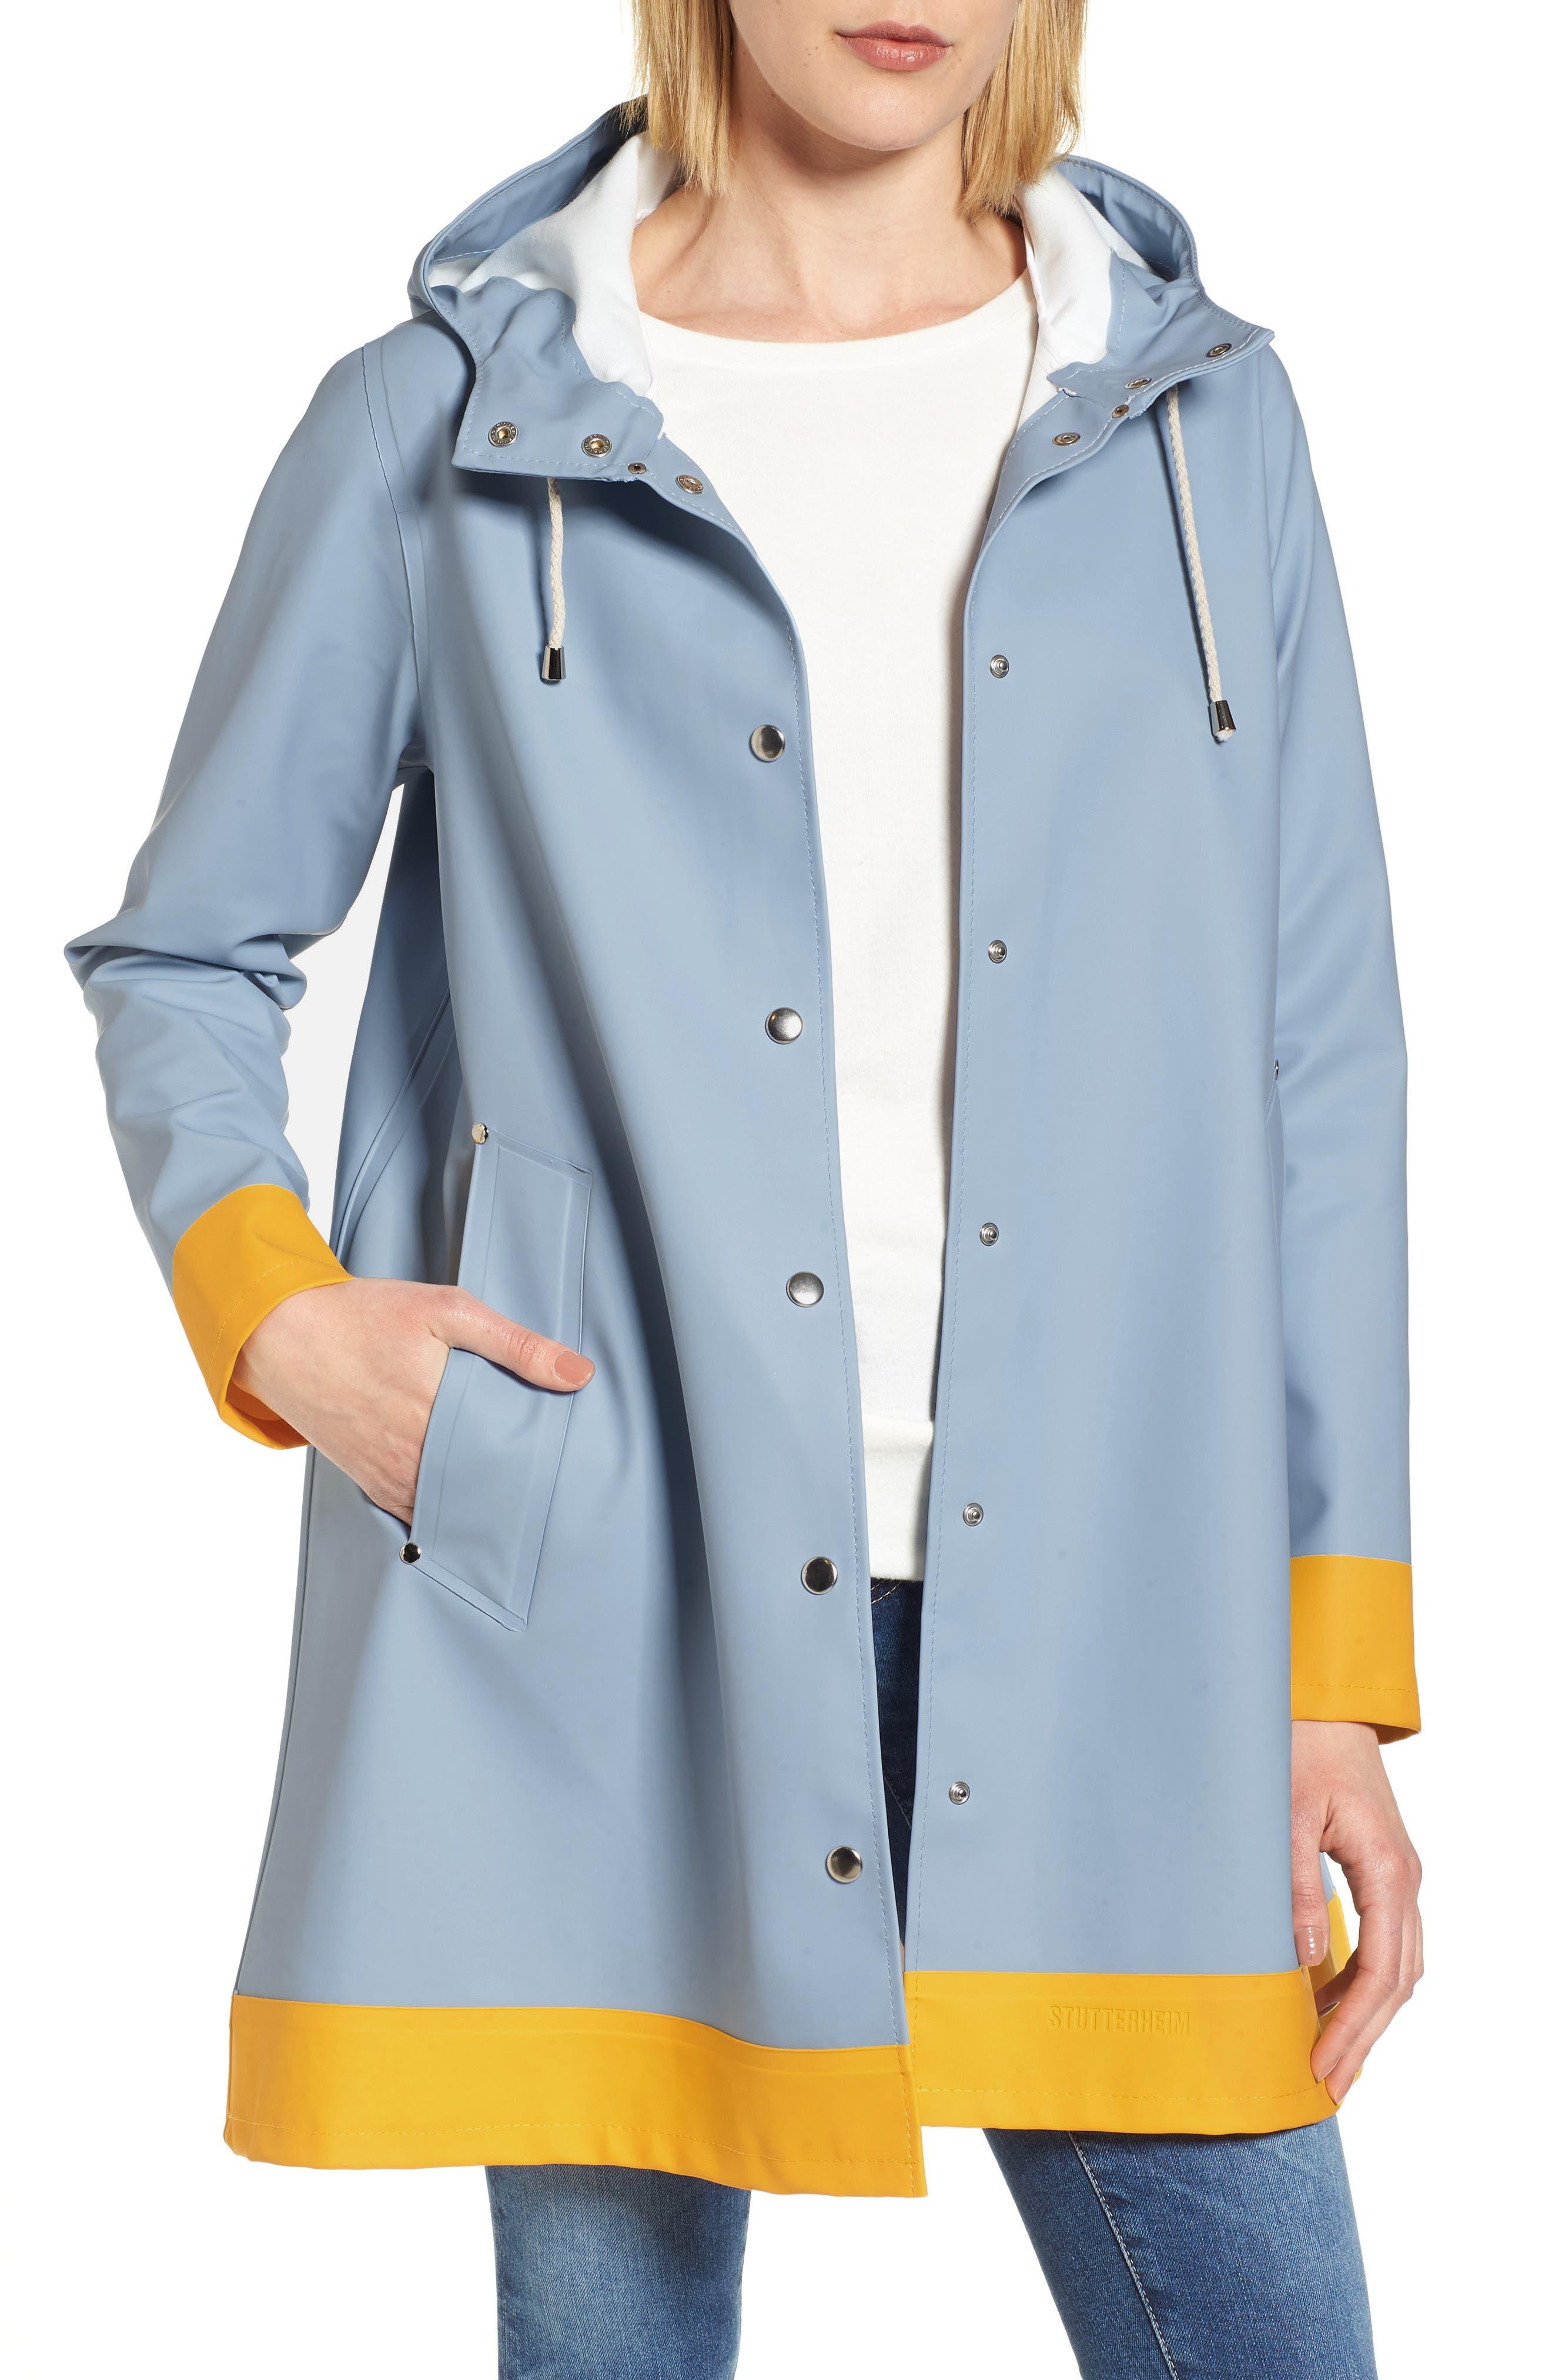 Stutterheim Mosebacke Frame Colorblock Raincoat